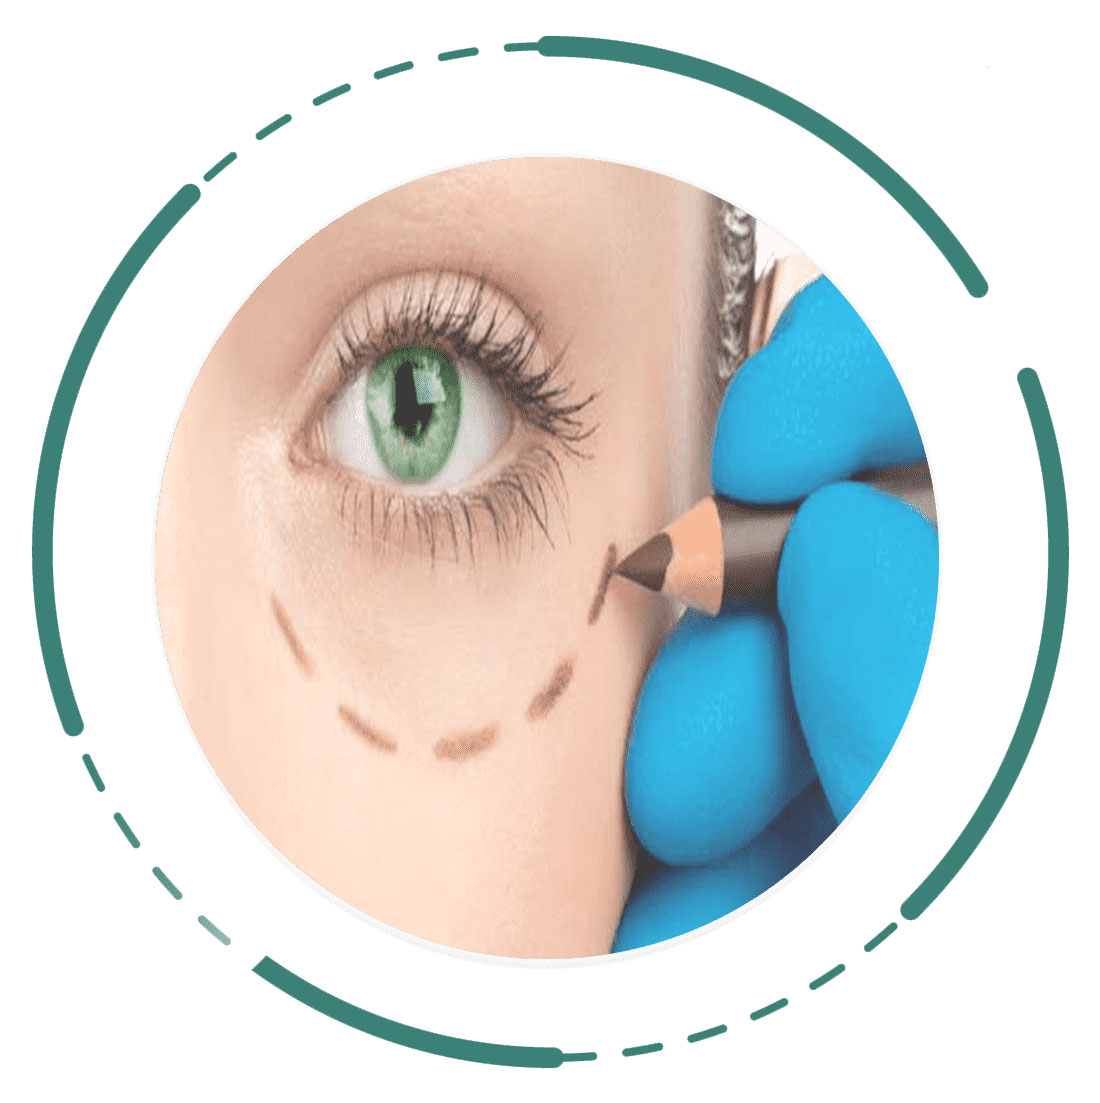 Eyelid-lift